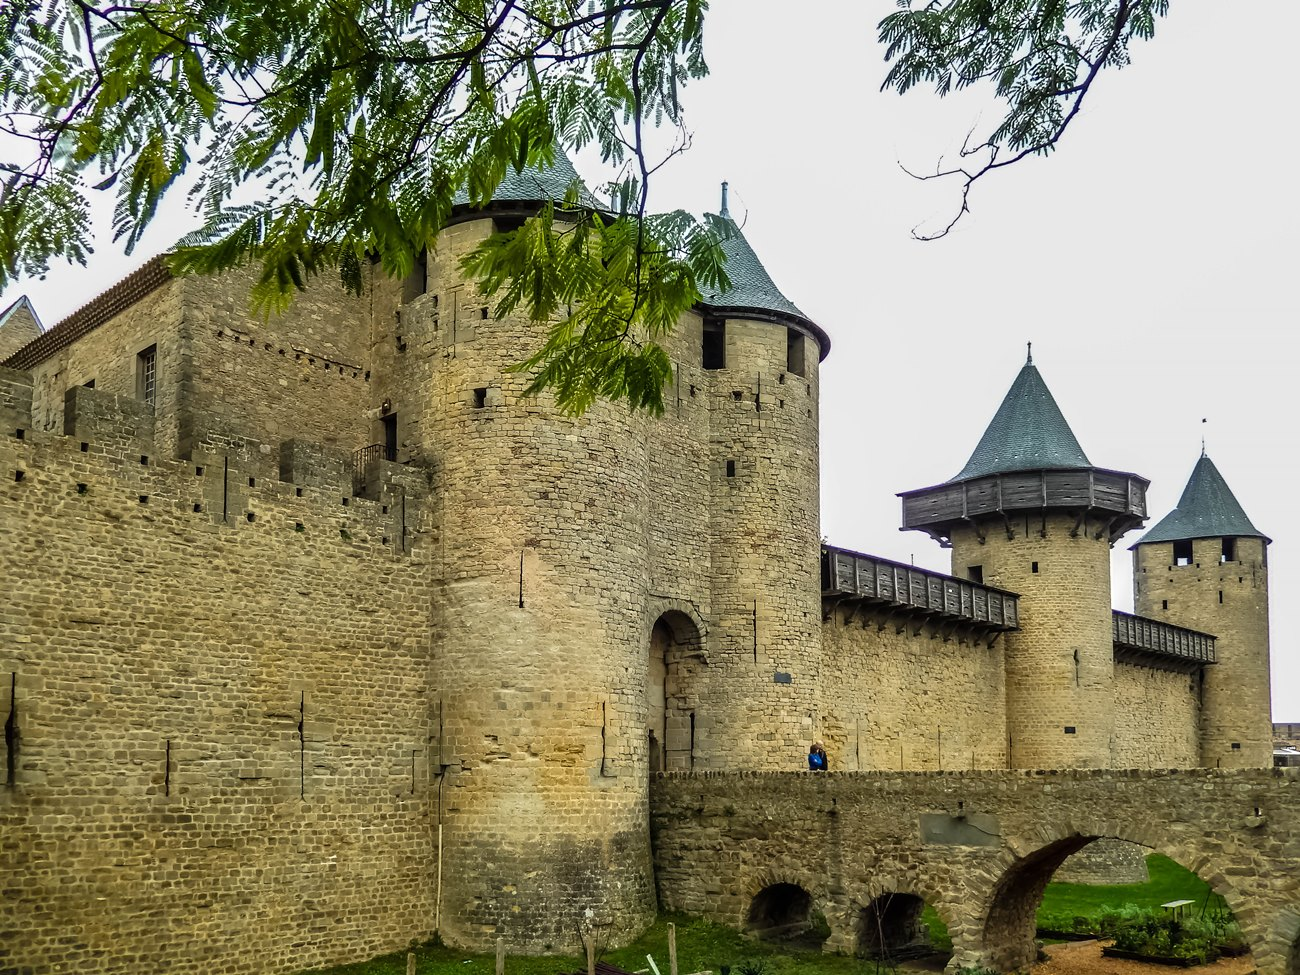 irina-fortuna-Carcassonne-france 10.jpg